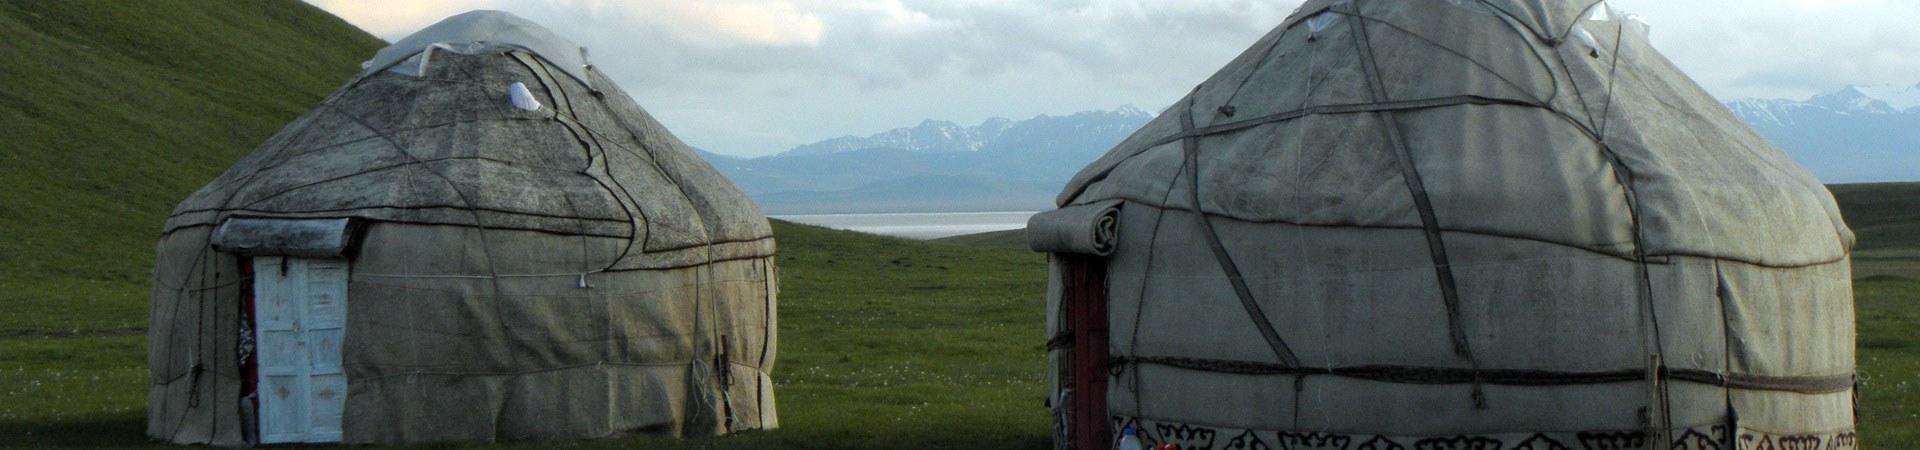 Jurten in Kirgistan